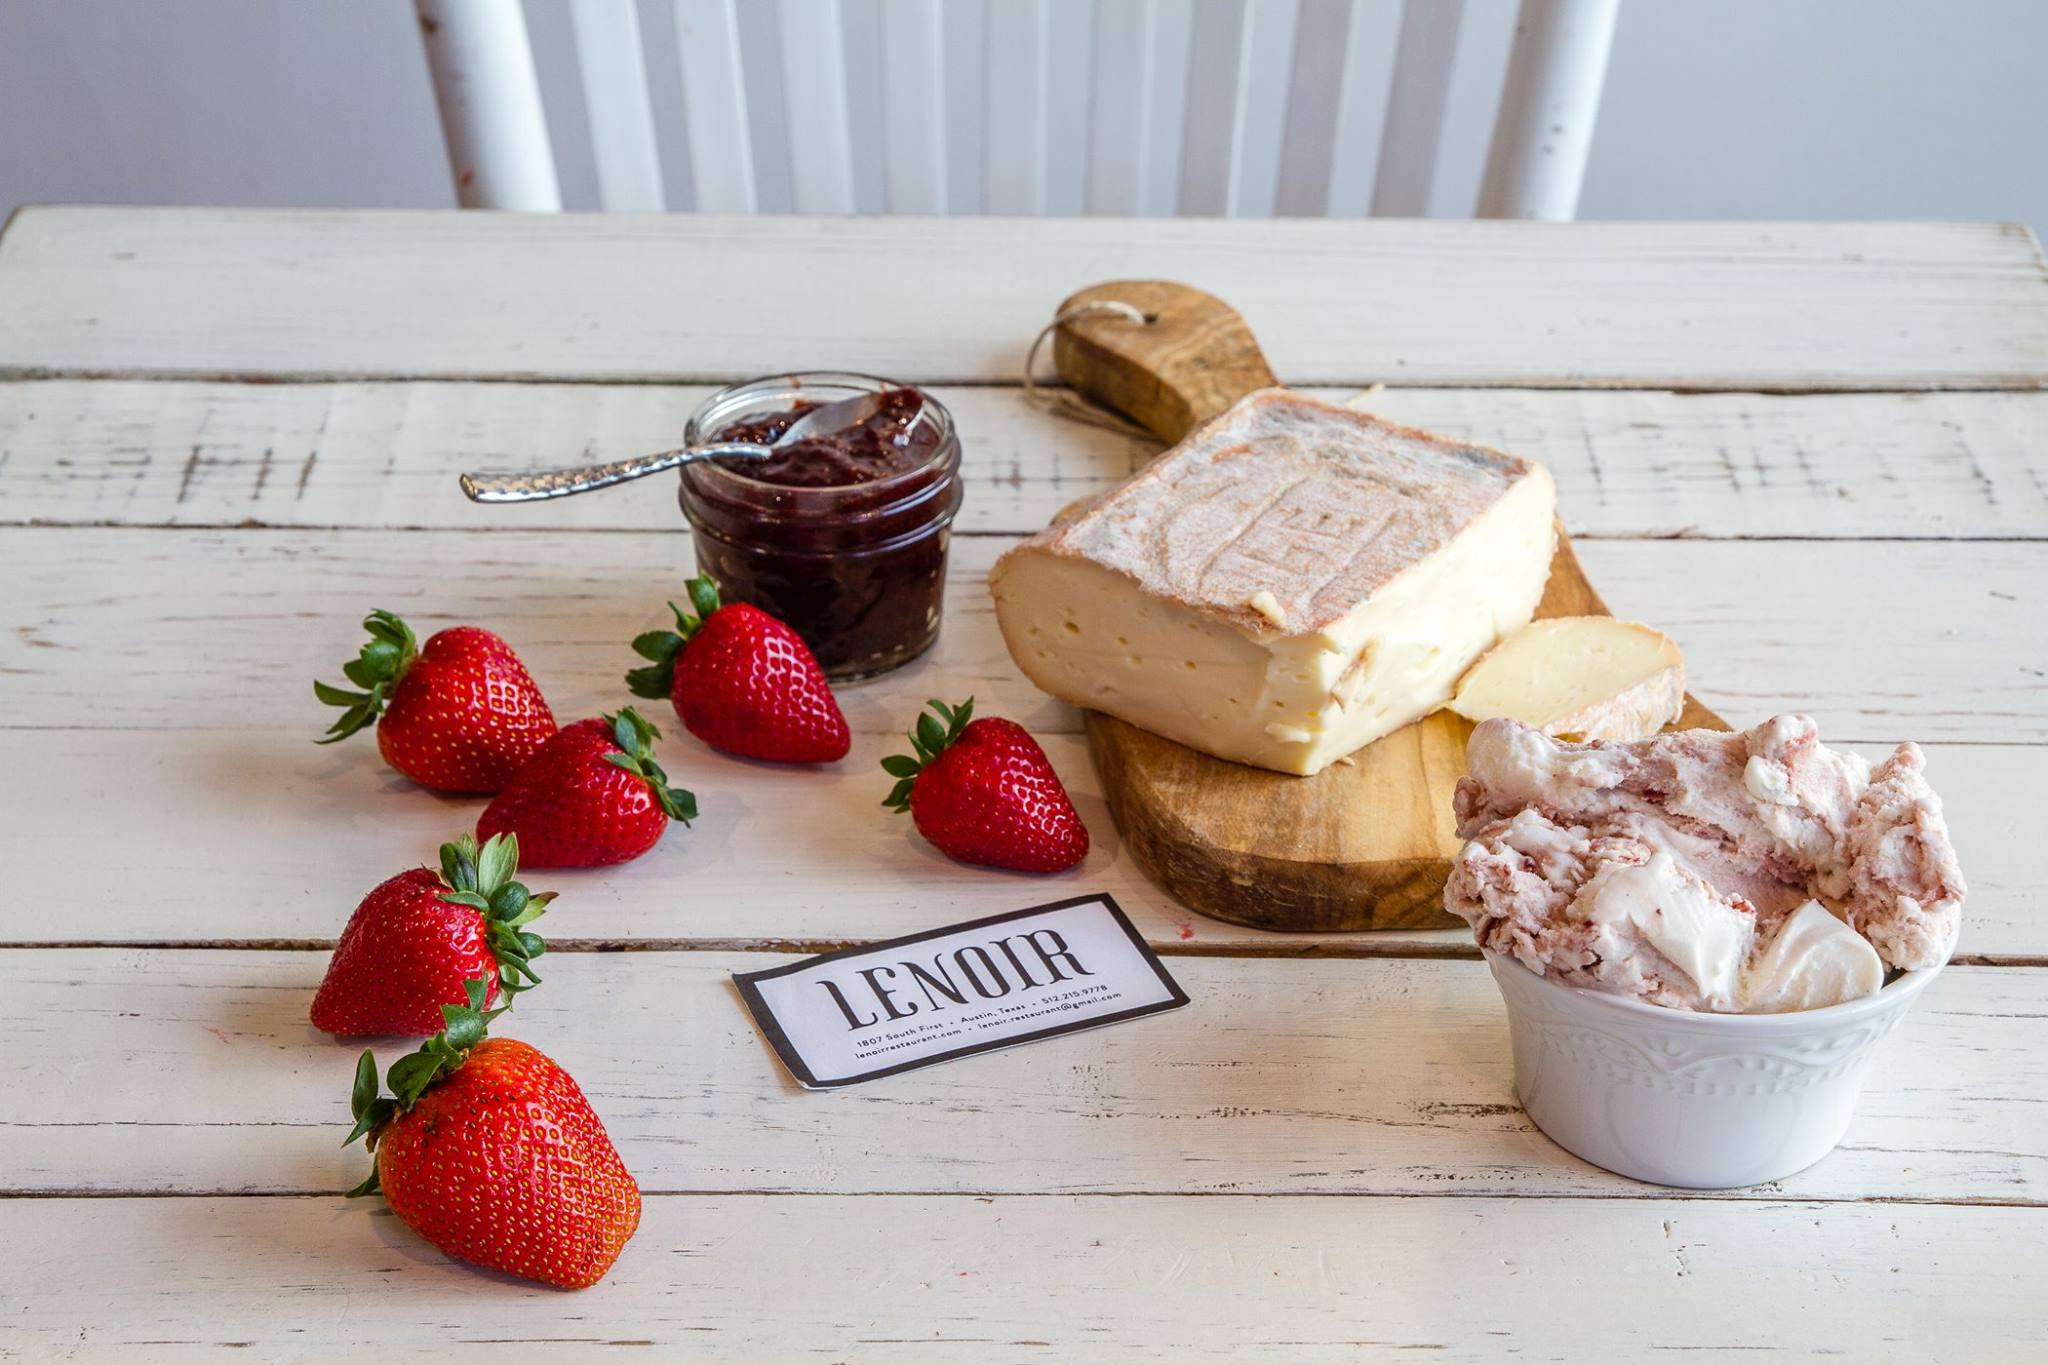 Dolce Neve's and Lenoir's Taleggio cheese gelato